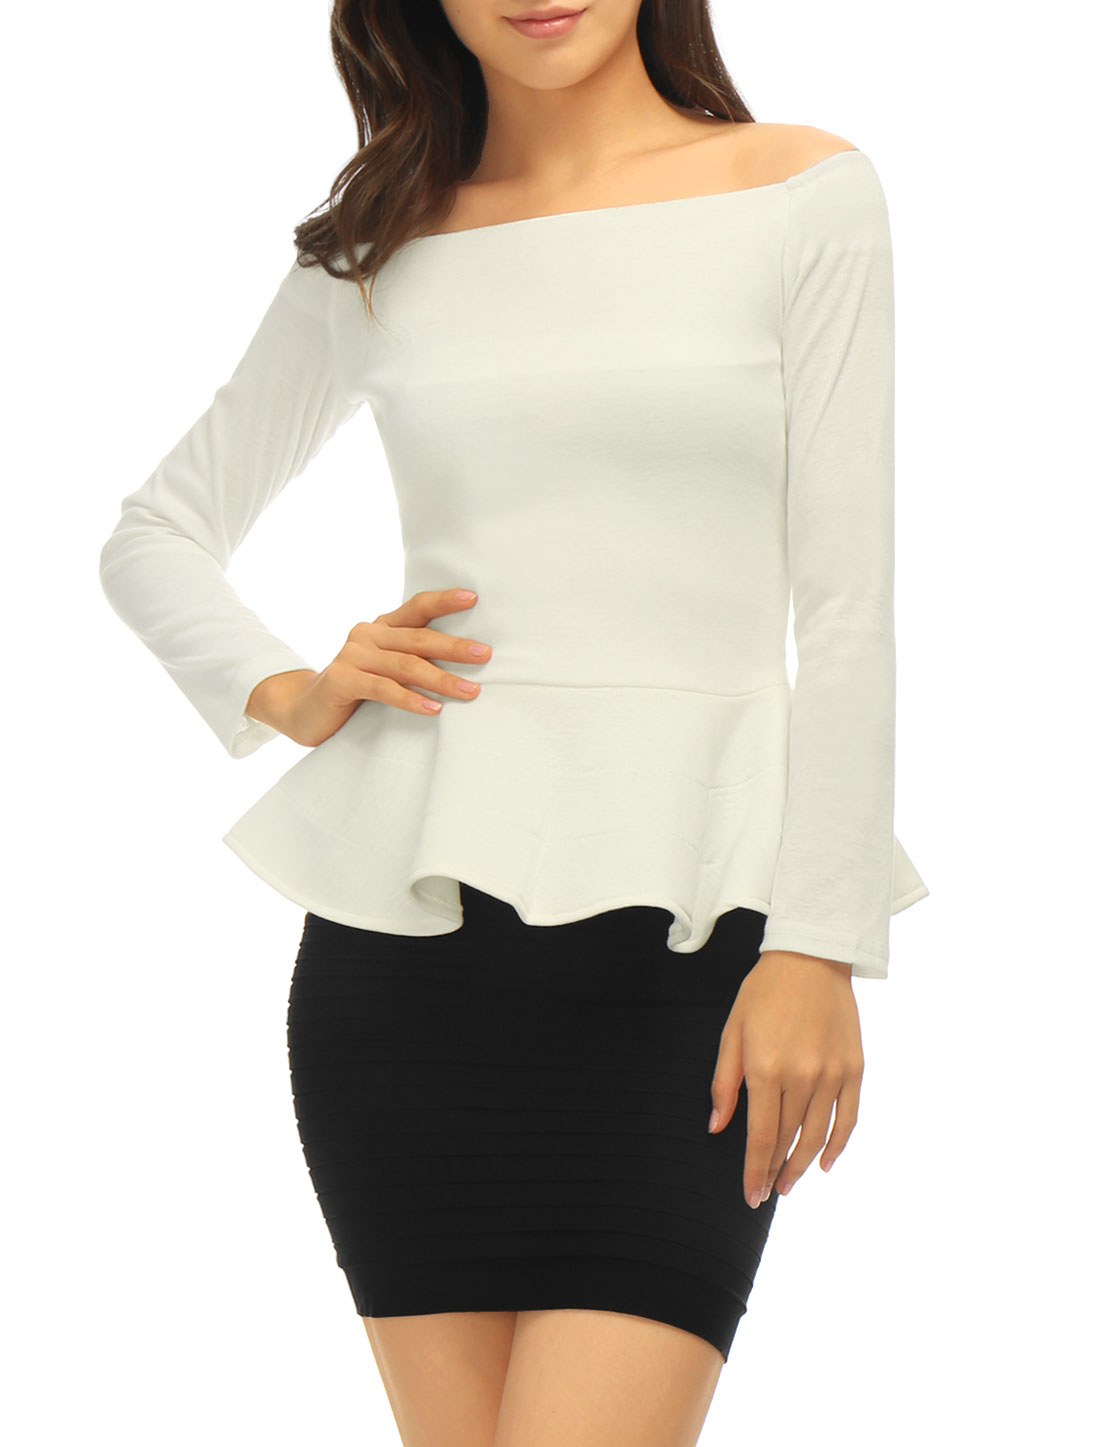 Women Off Shoulder Long Sleeves Slim Fit Peplum Top Off White XL